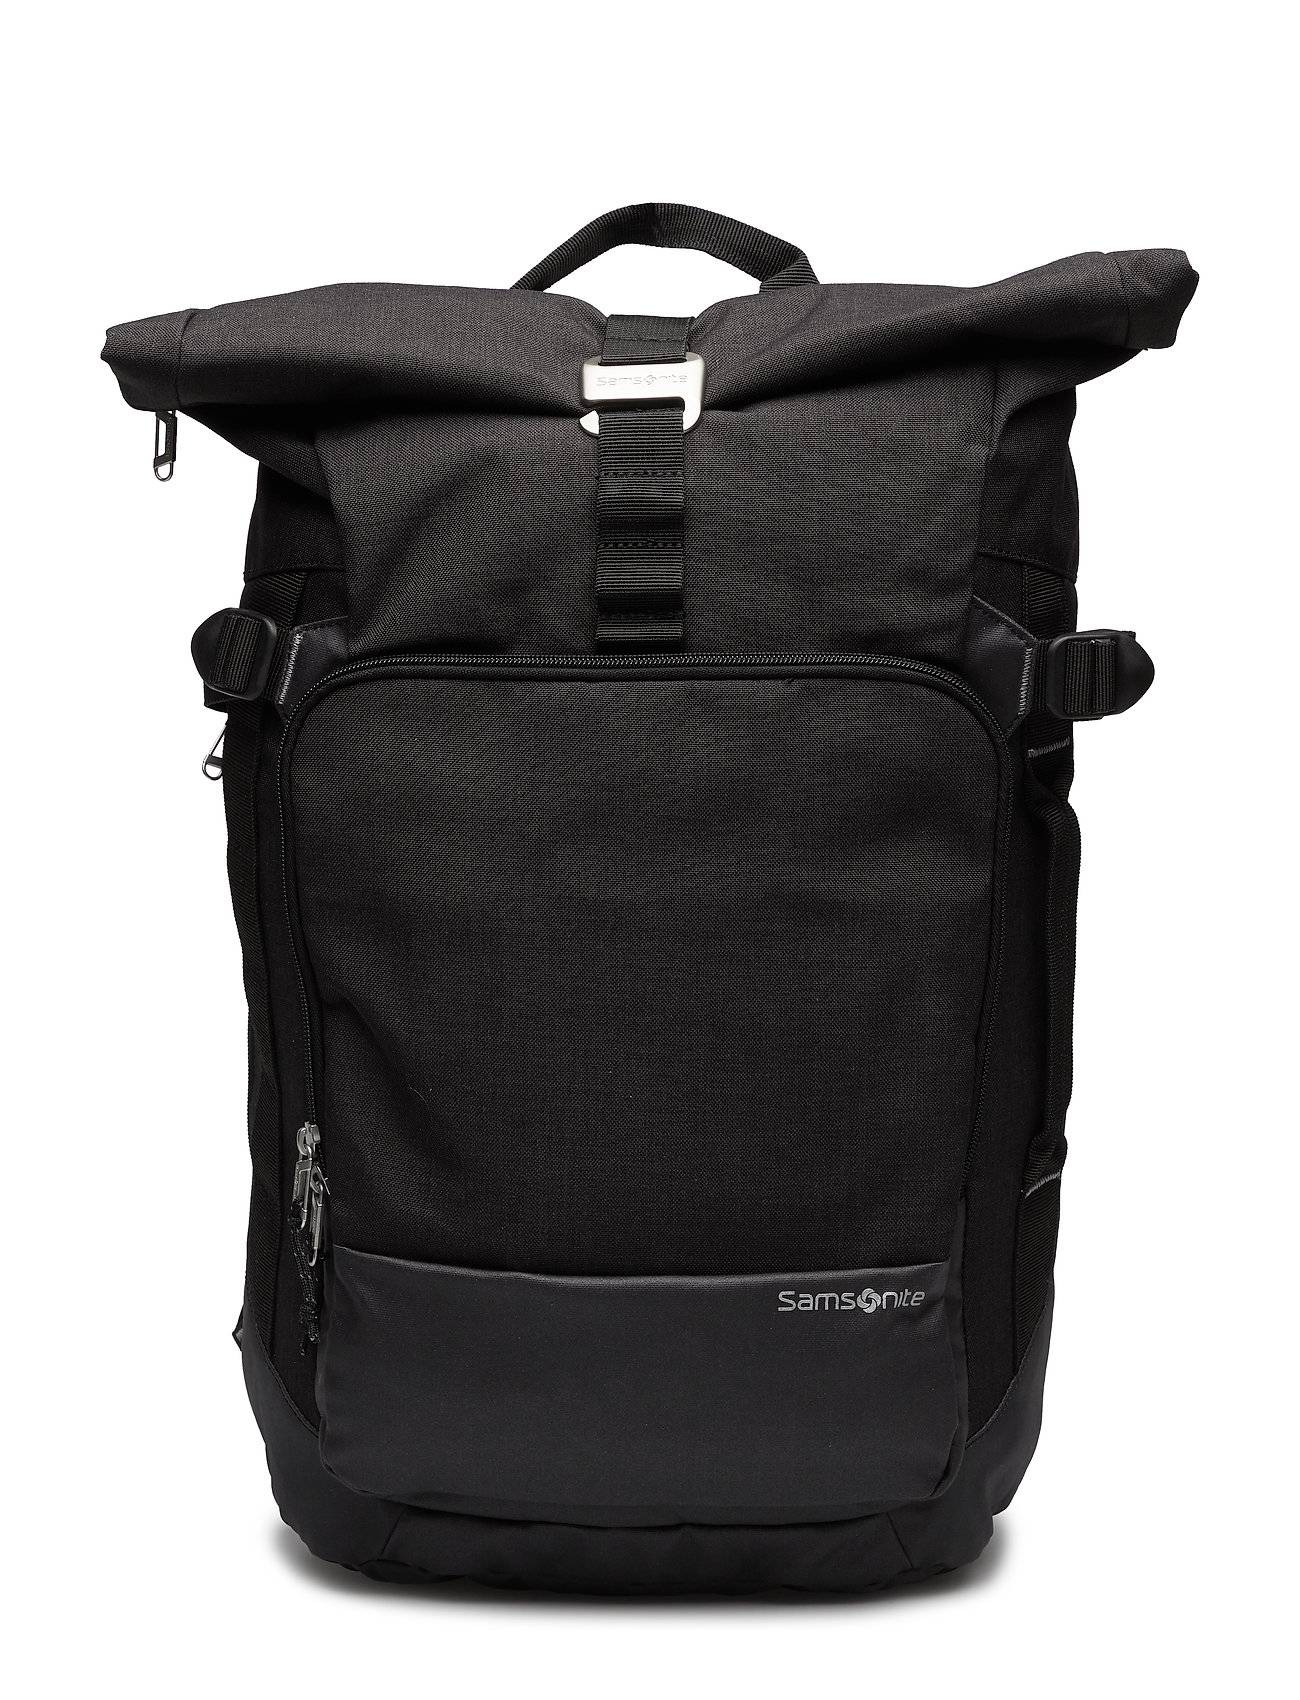 Samsonite Ziproll Backpack M